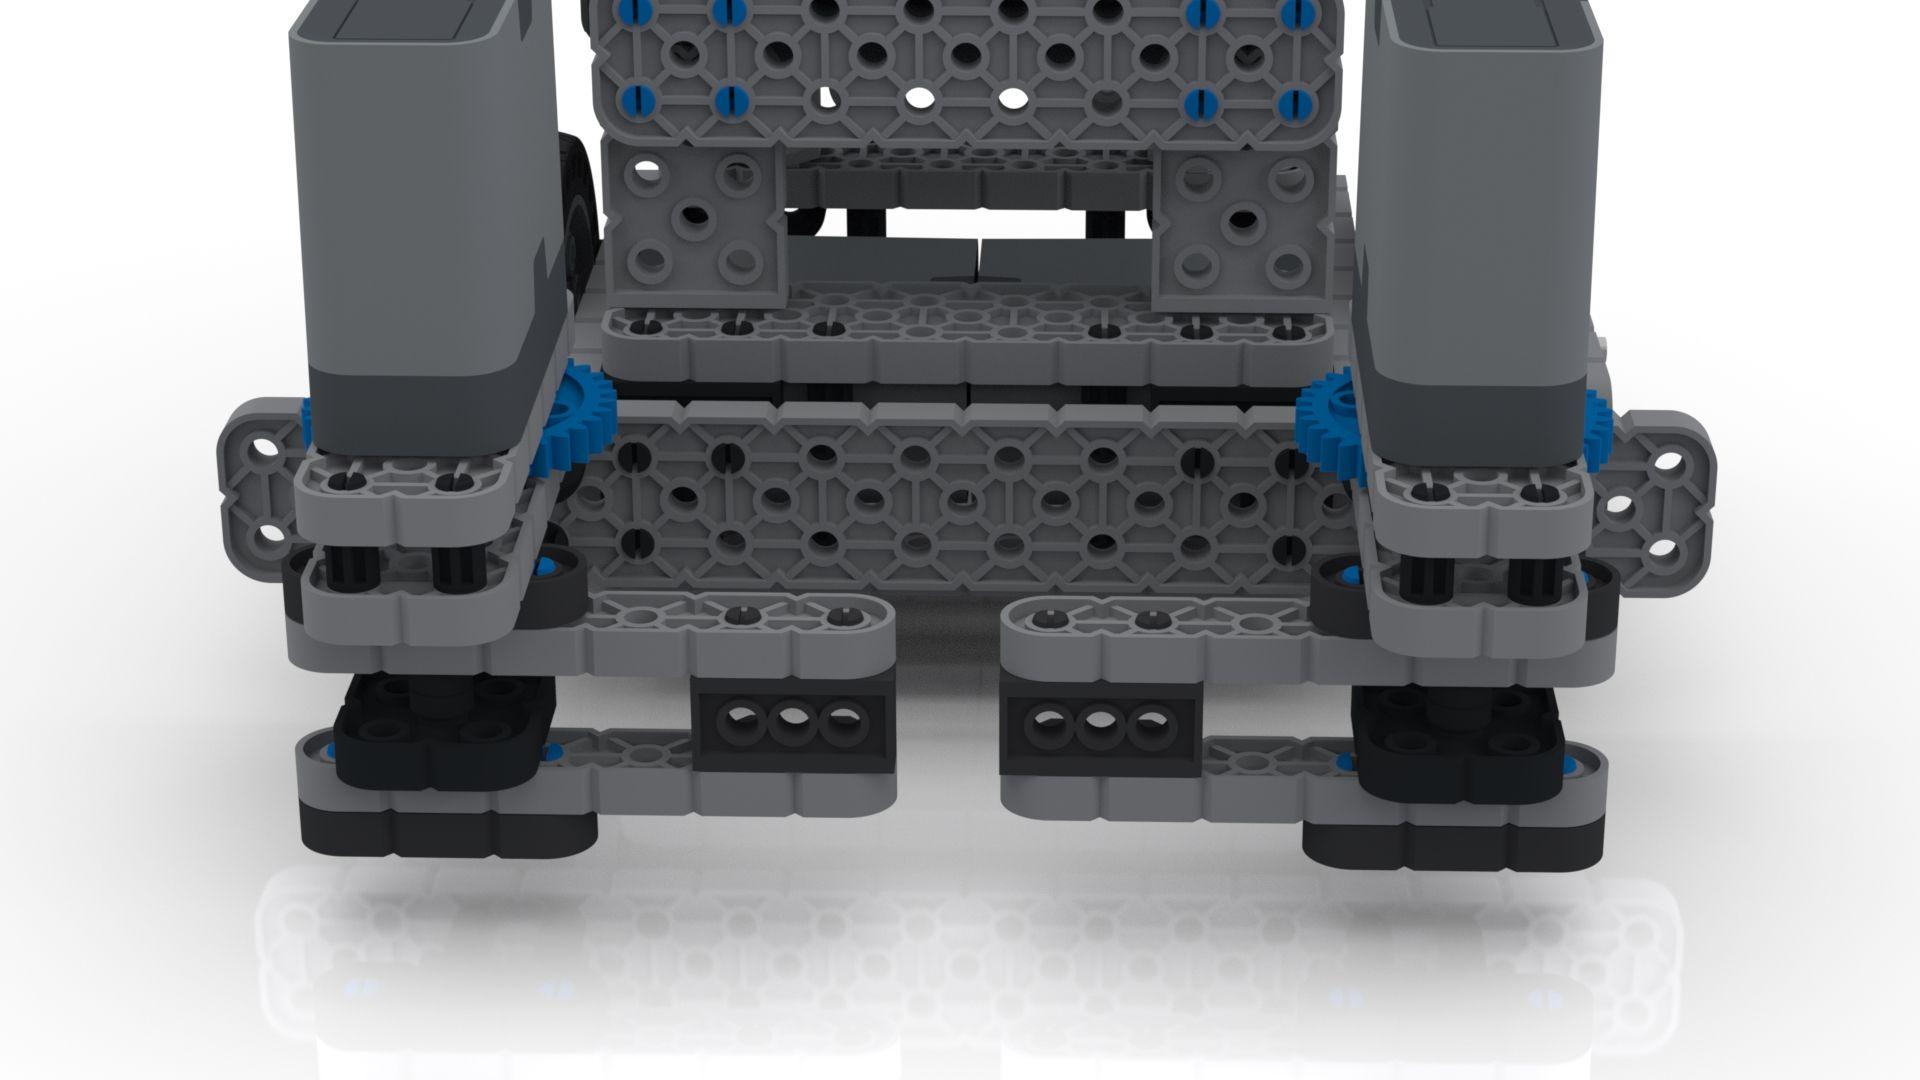 Fabrica-de-nerdes-vex-iq-lucas5-3500-3500